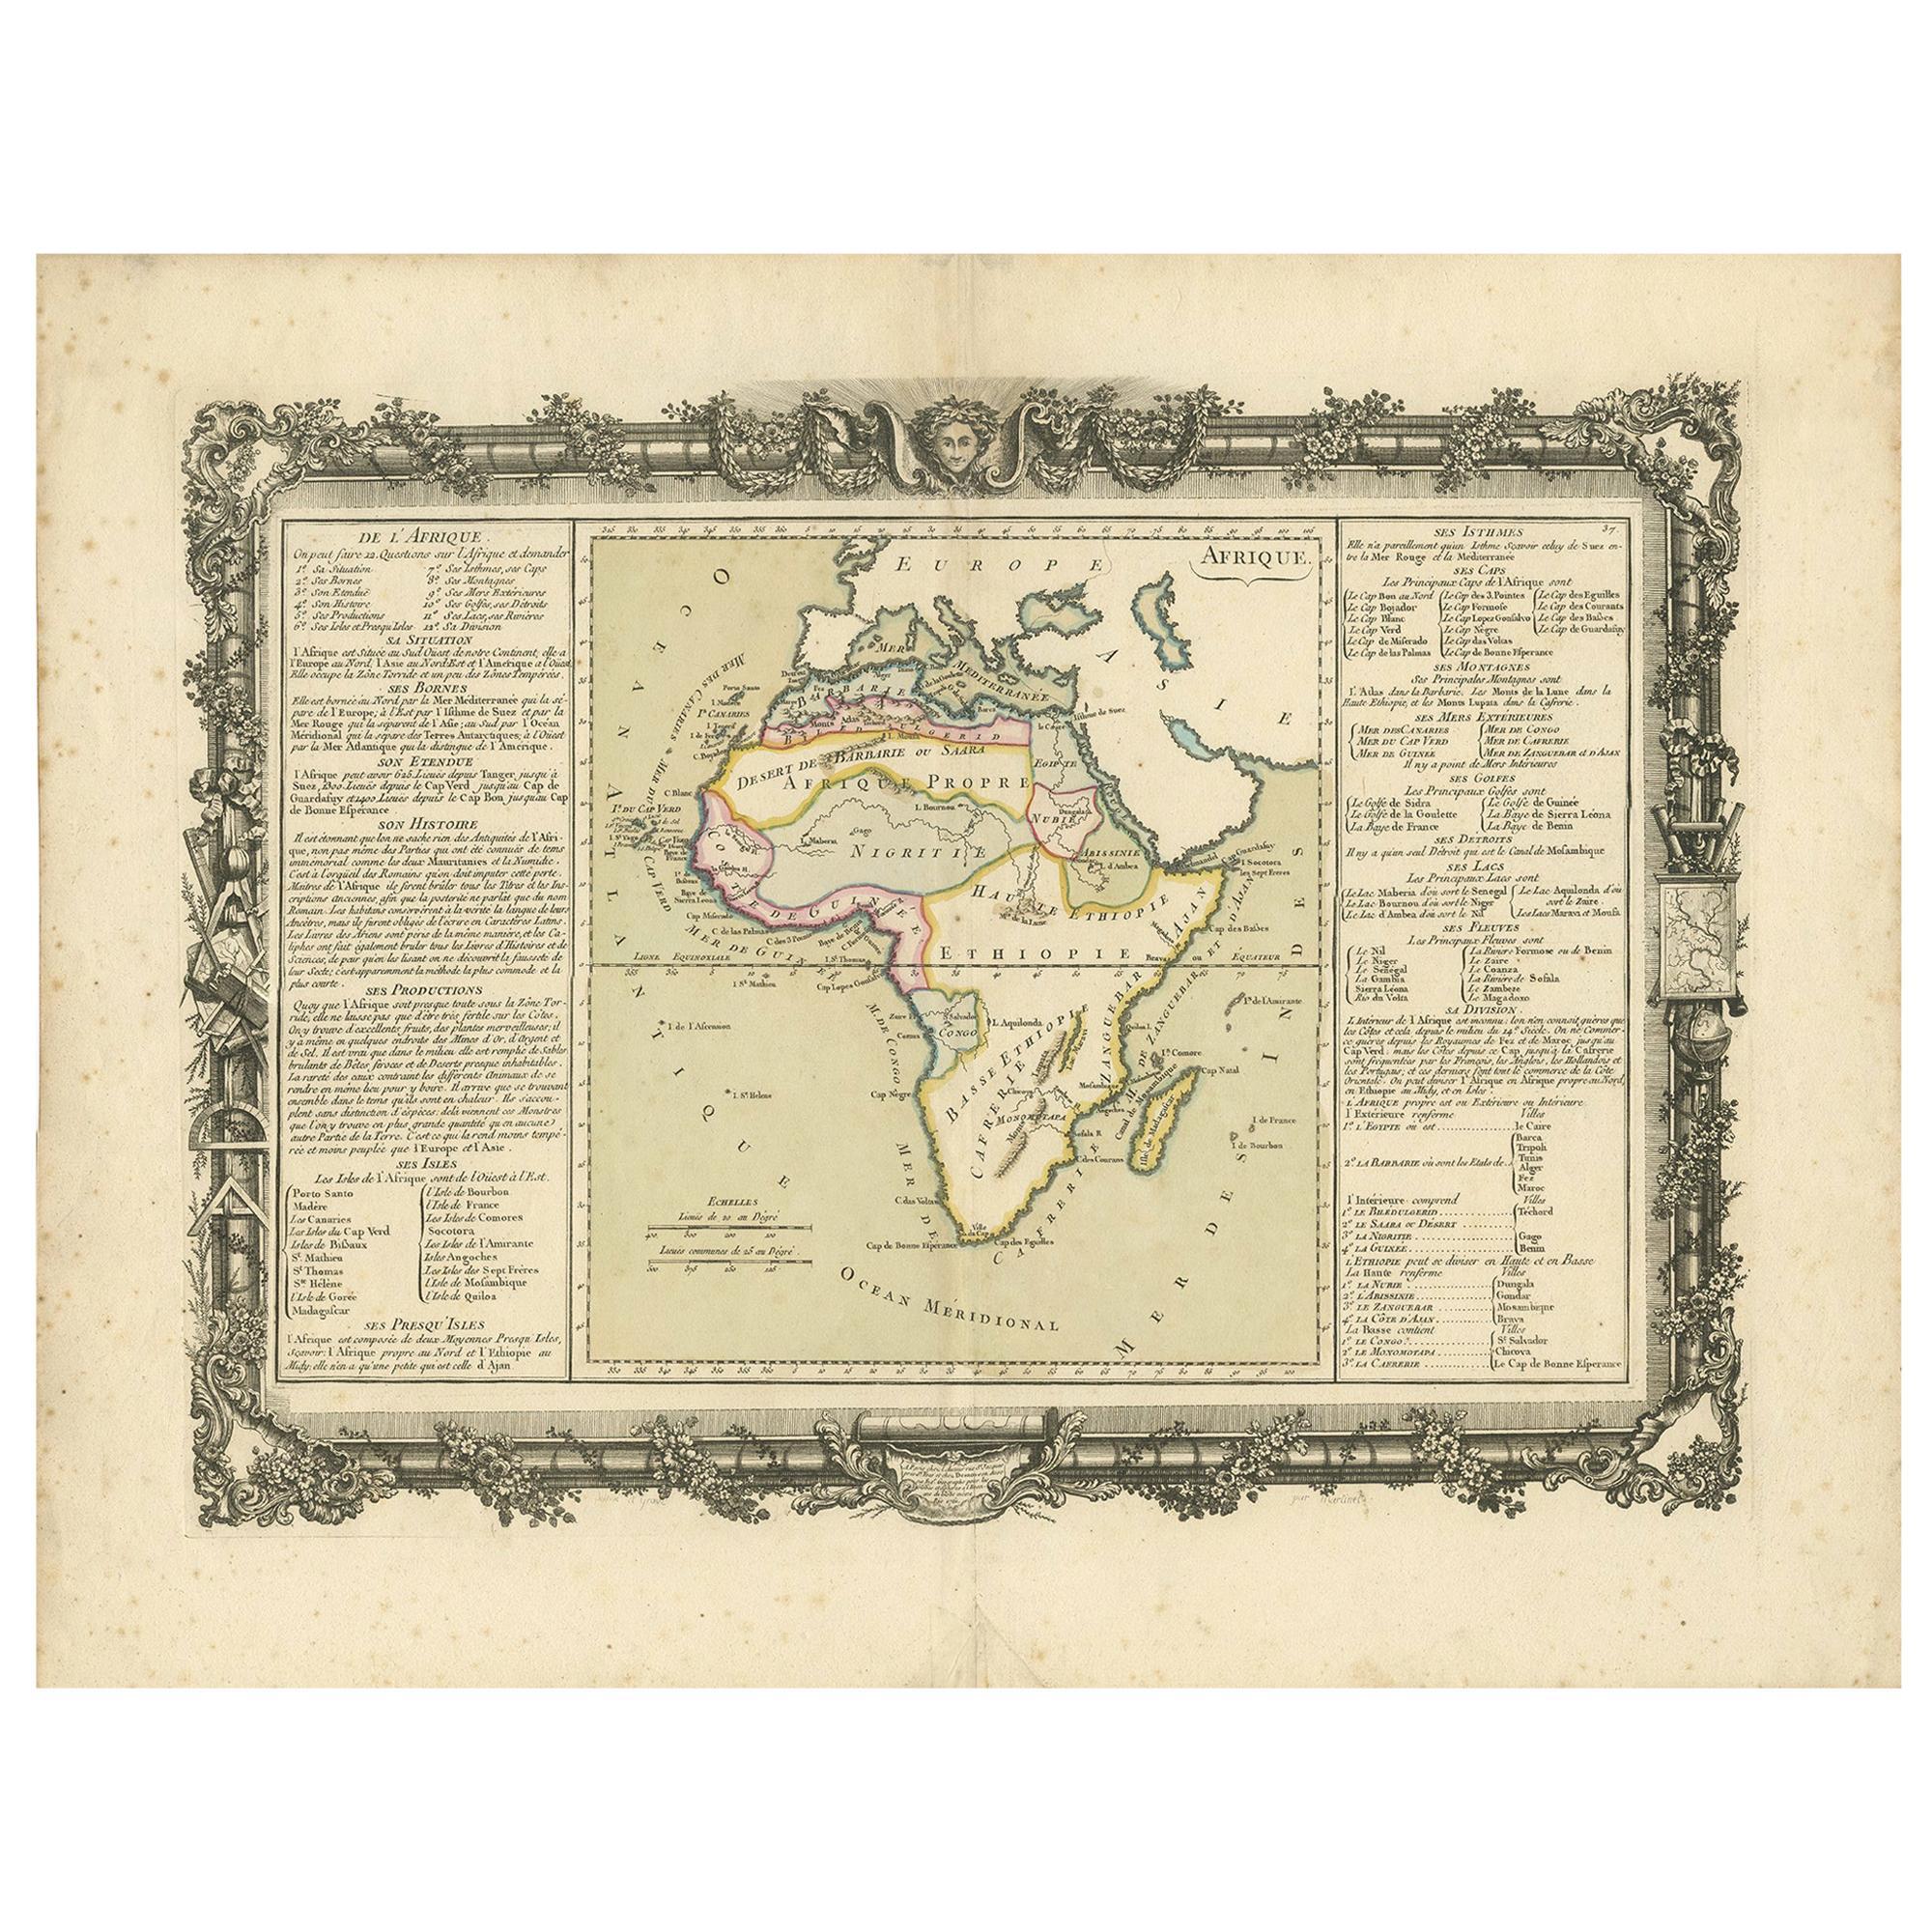 Antique Map of Africa by Claude Buy de Mornas '1761'